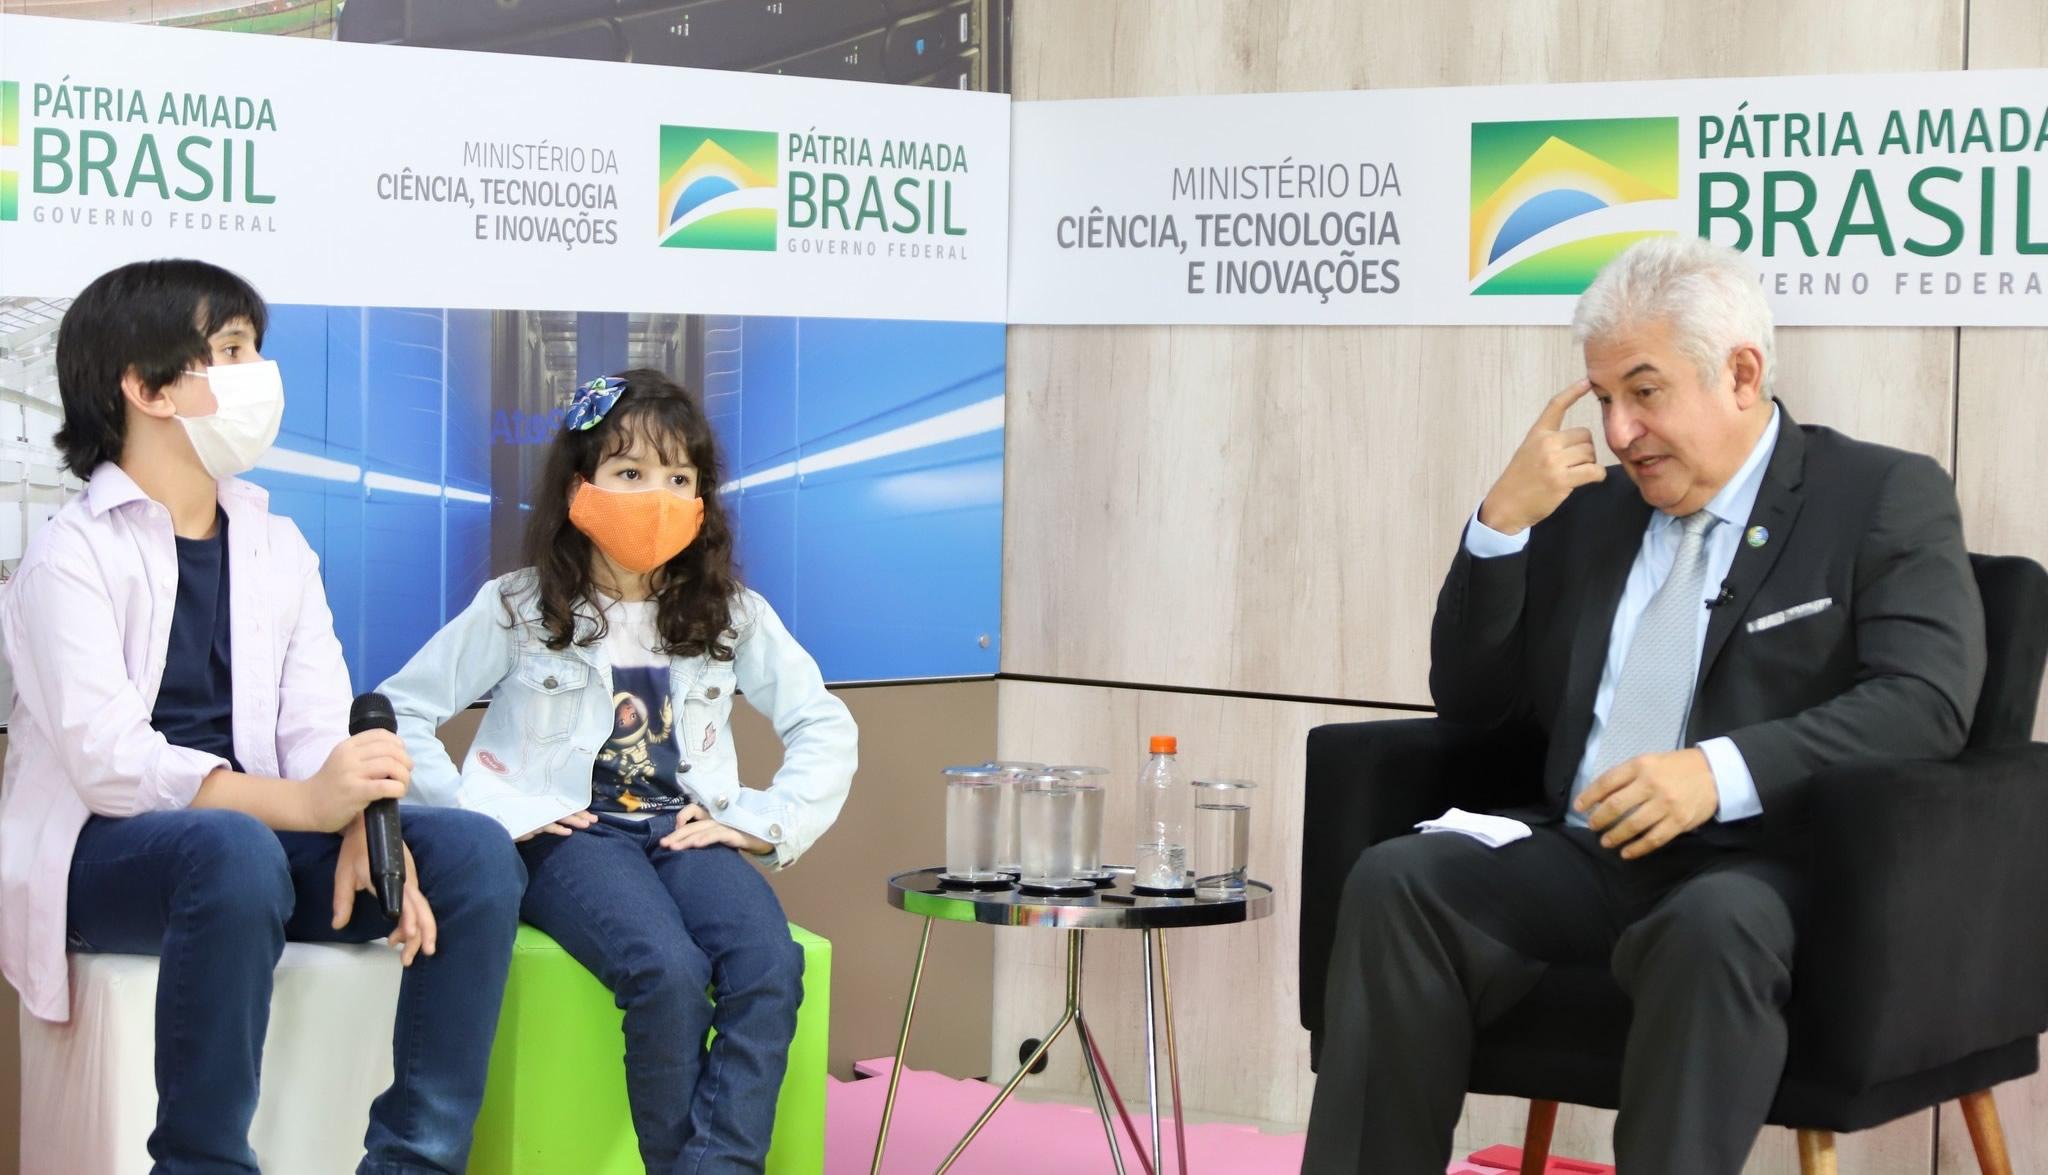 Já entrevistou grandes nomes como o Sr. Ministro Marcos César Pontes, a astrofísica Duília de Mello e muitos outros